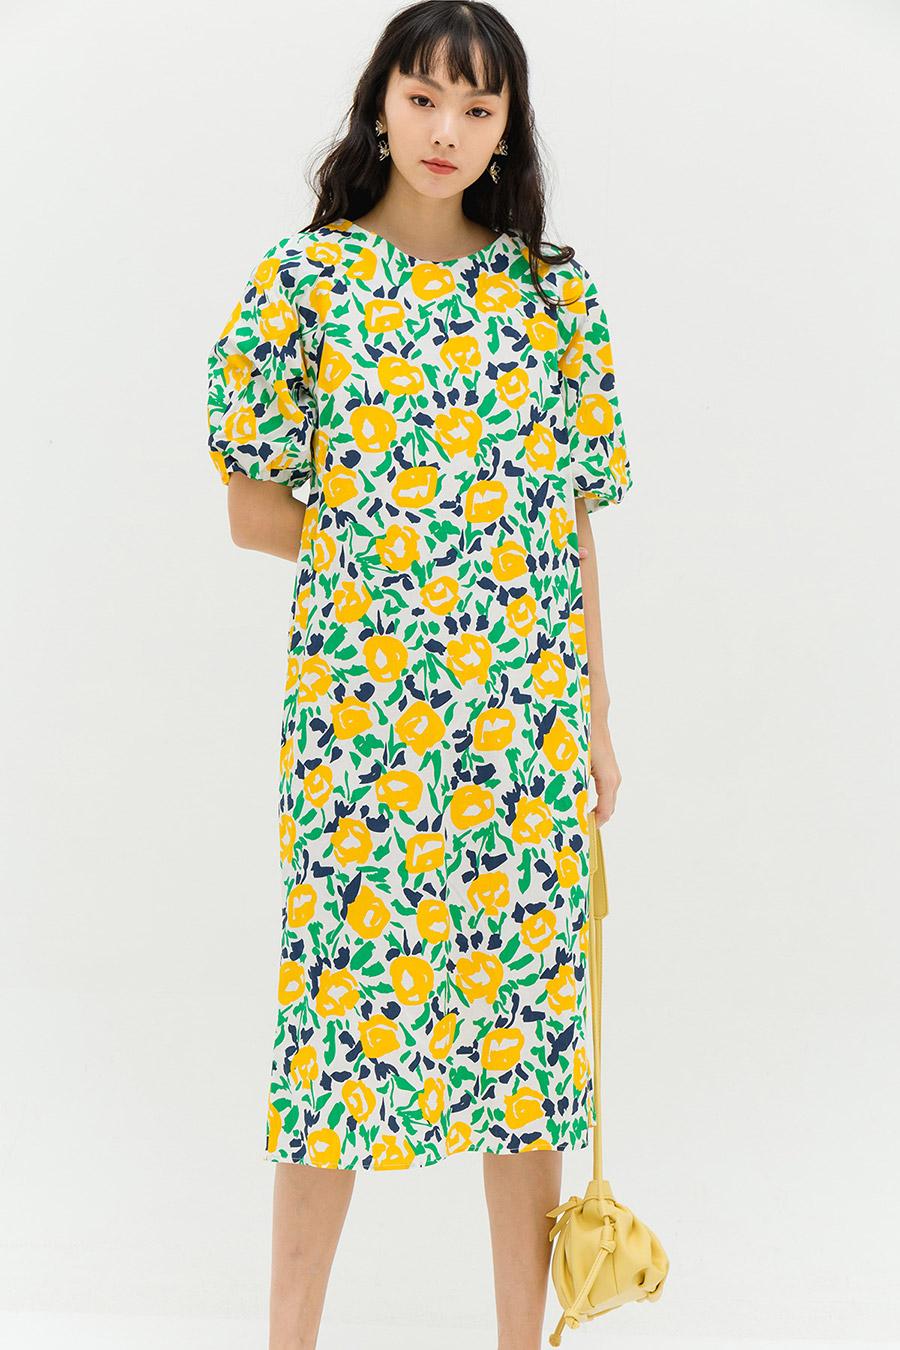 DESIREE DRESS - CANARY FLEUR